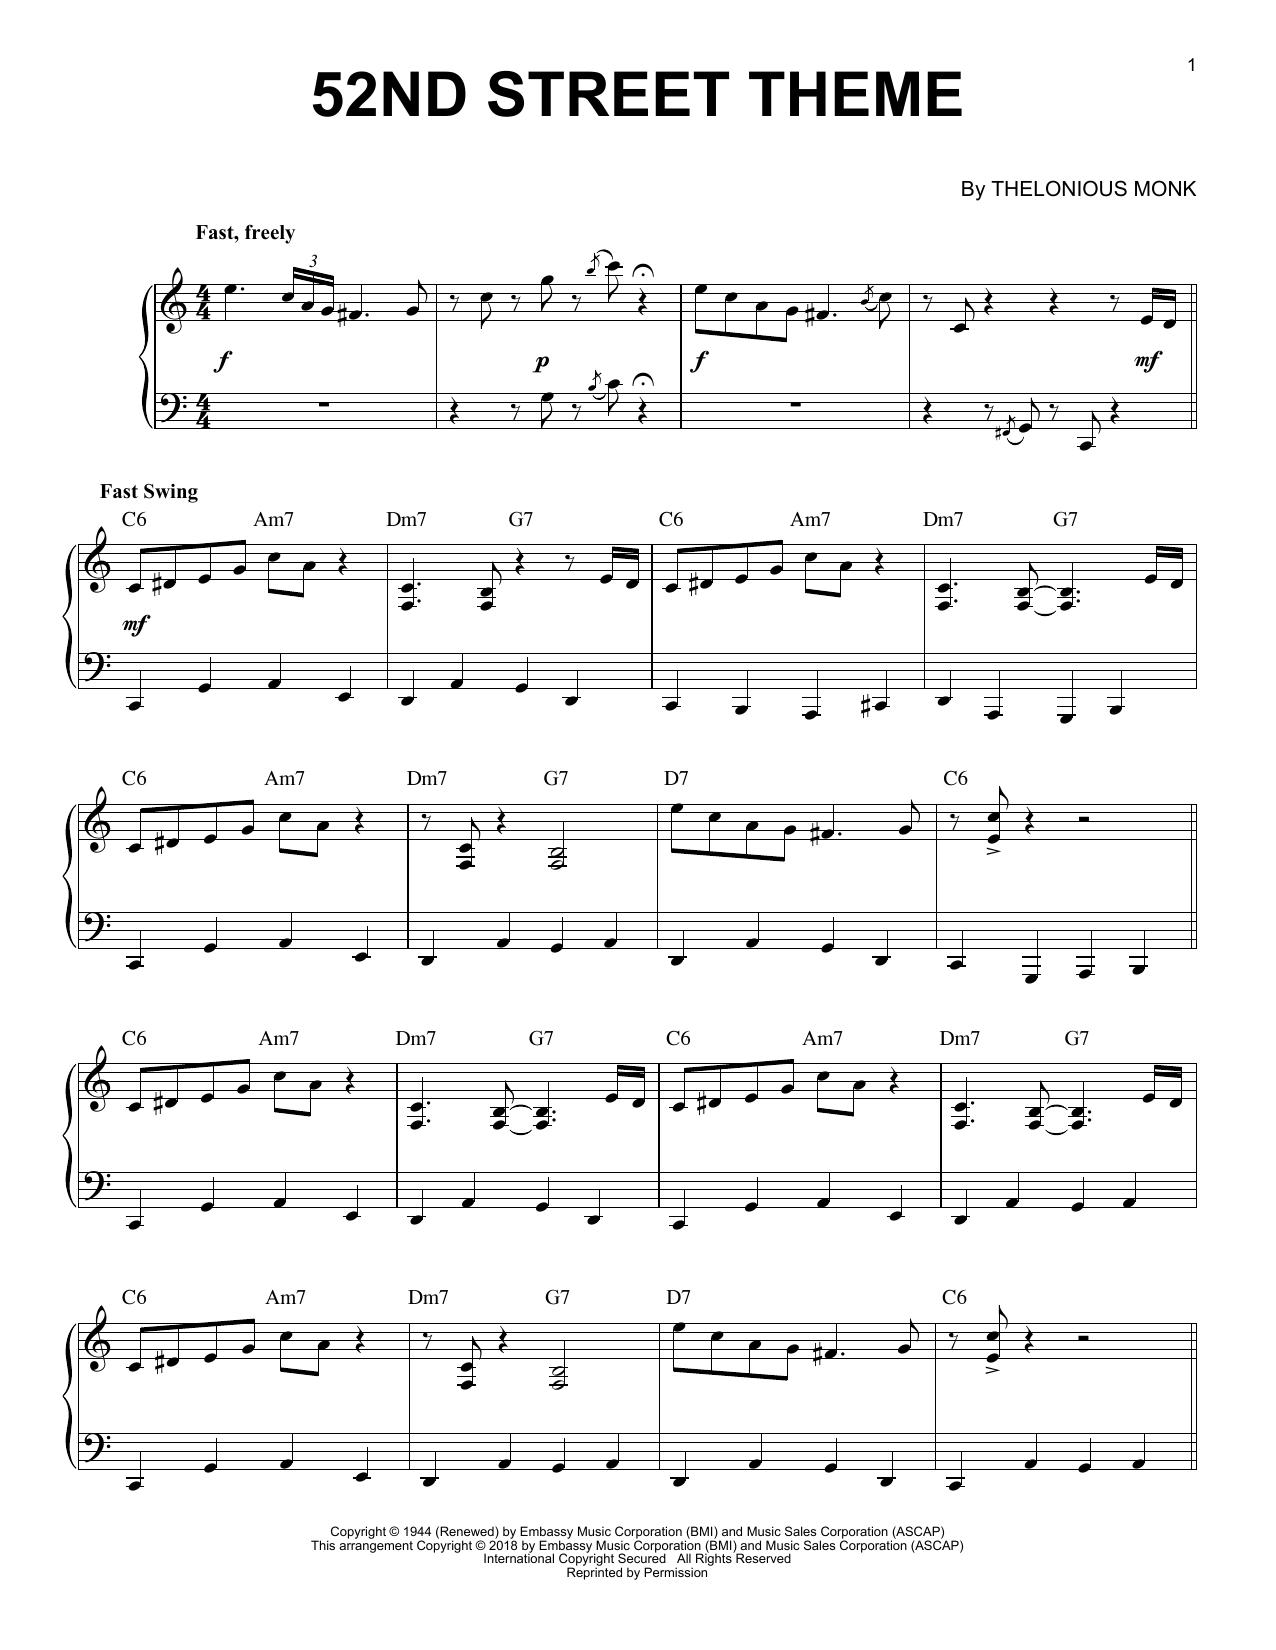 52nd Street Theme (Piano Solo)